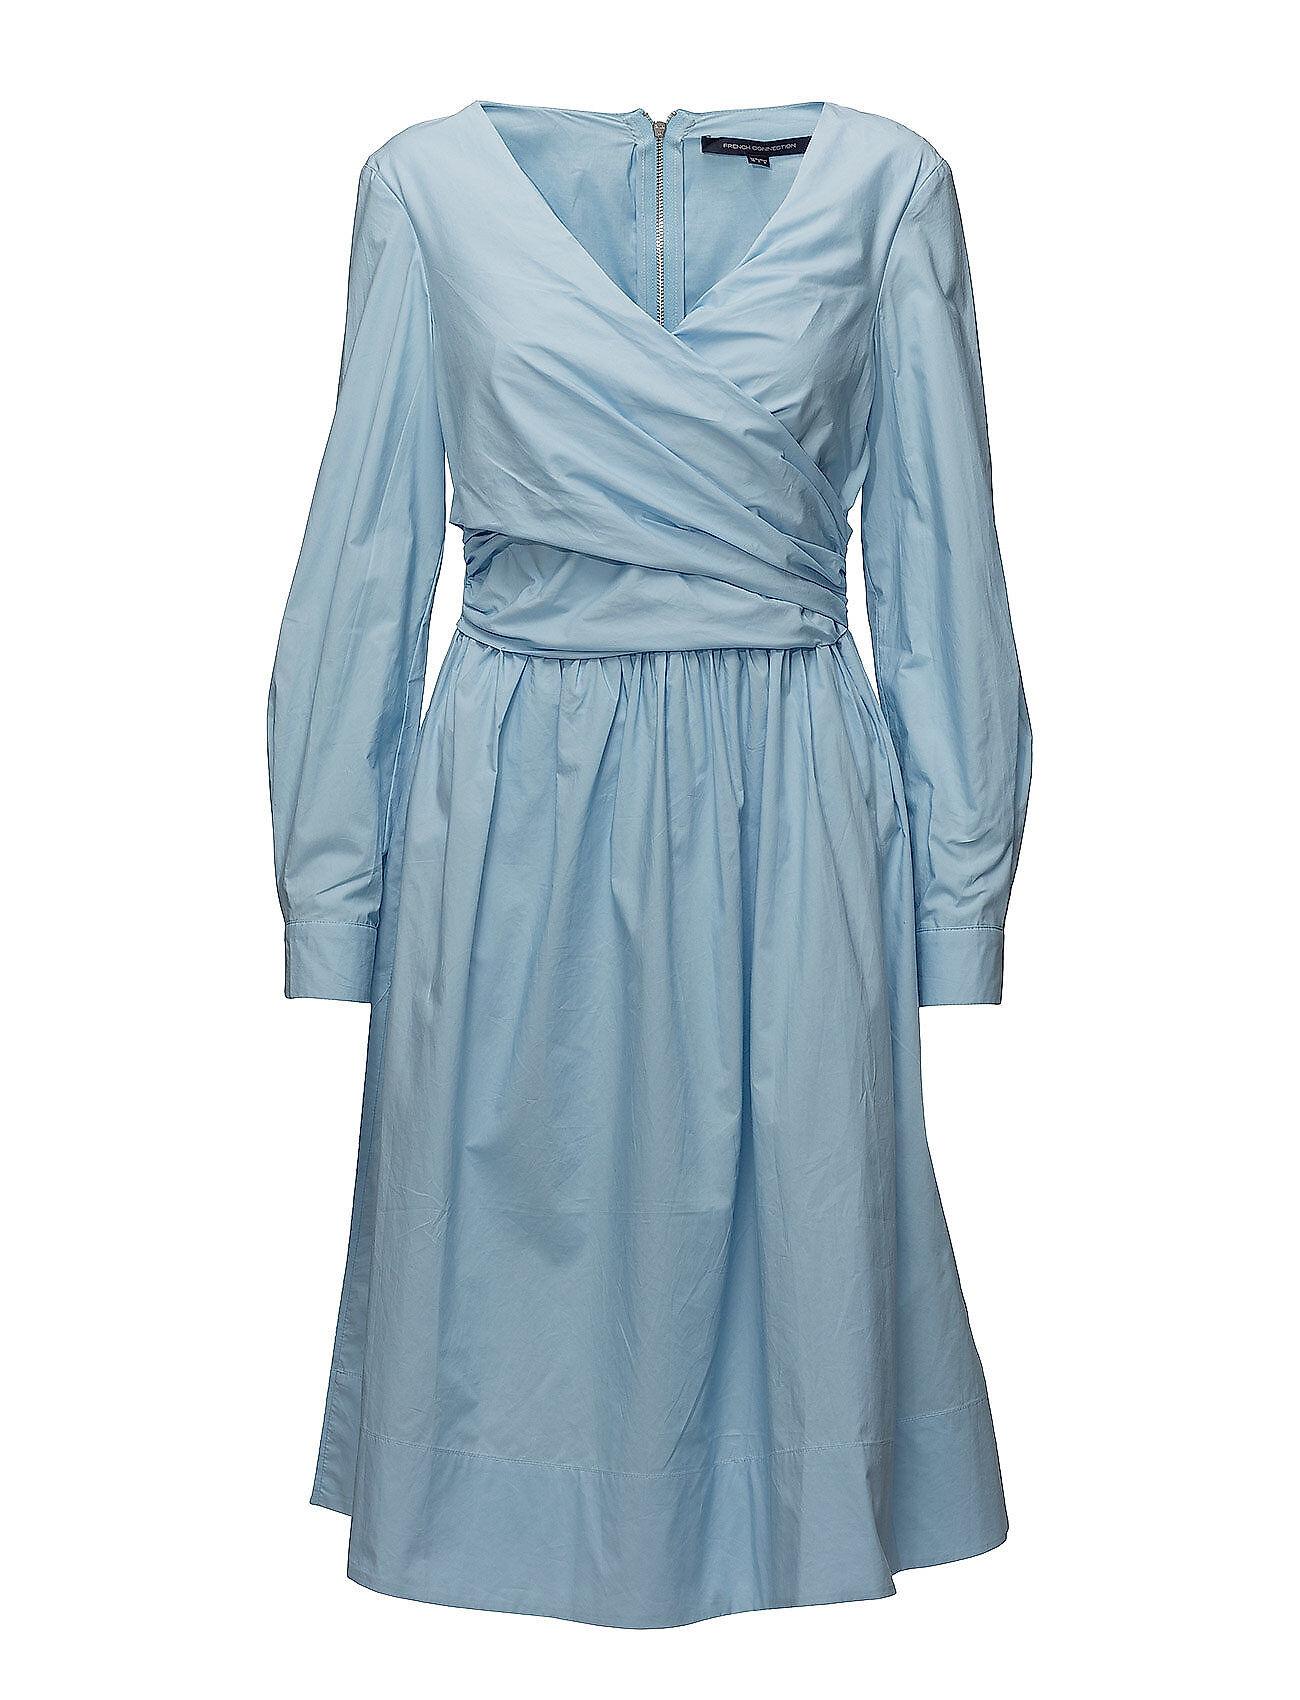 French Connection Eastside Cotton V-Neck Flared Dress